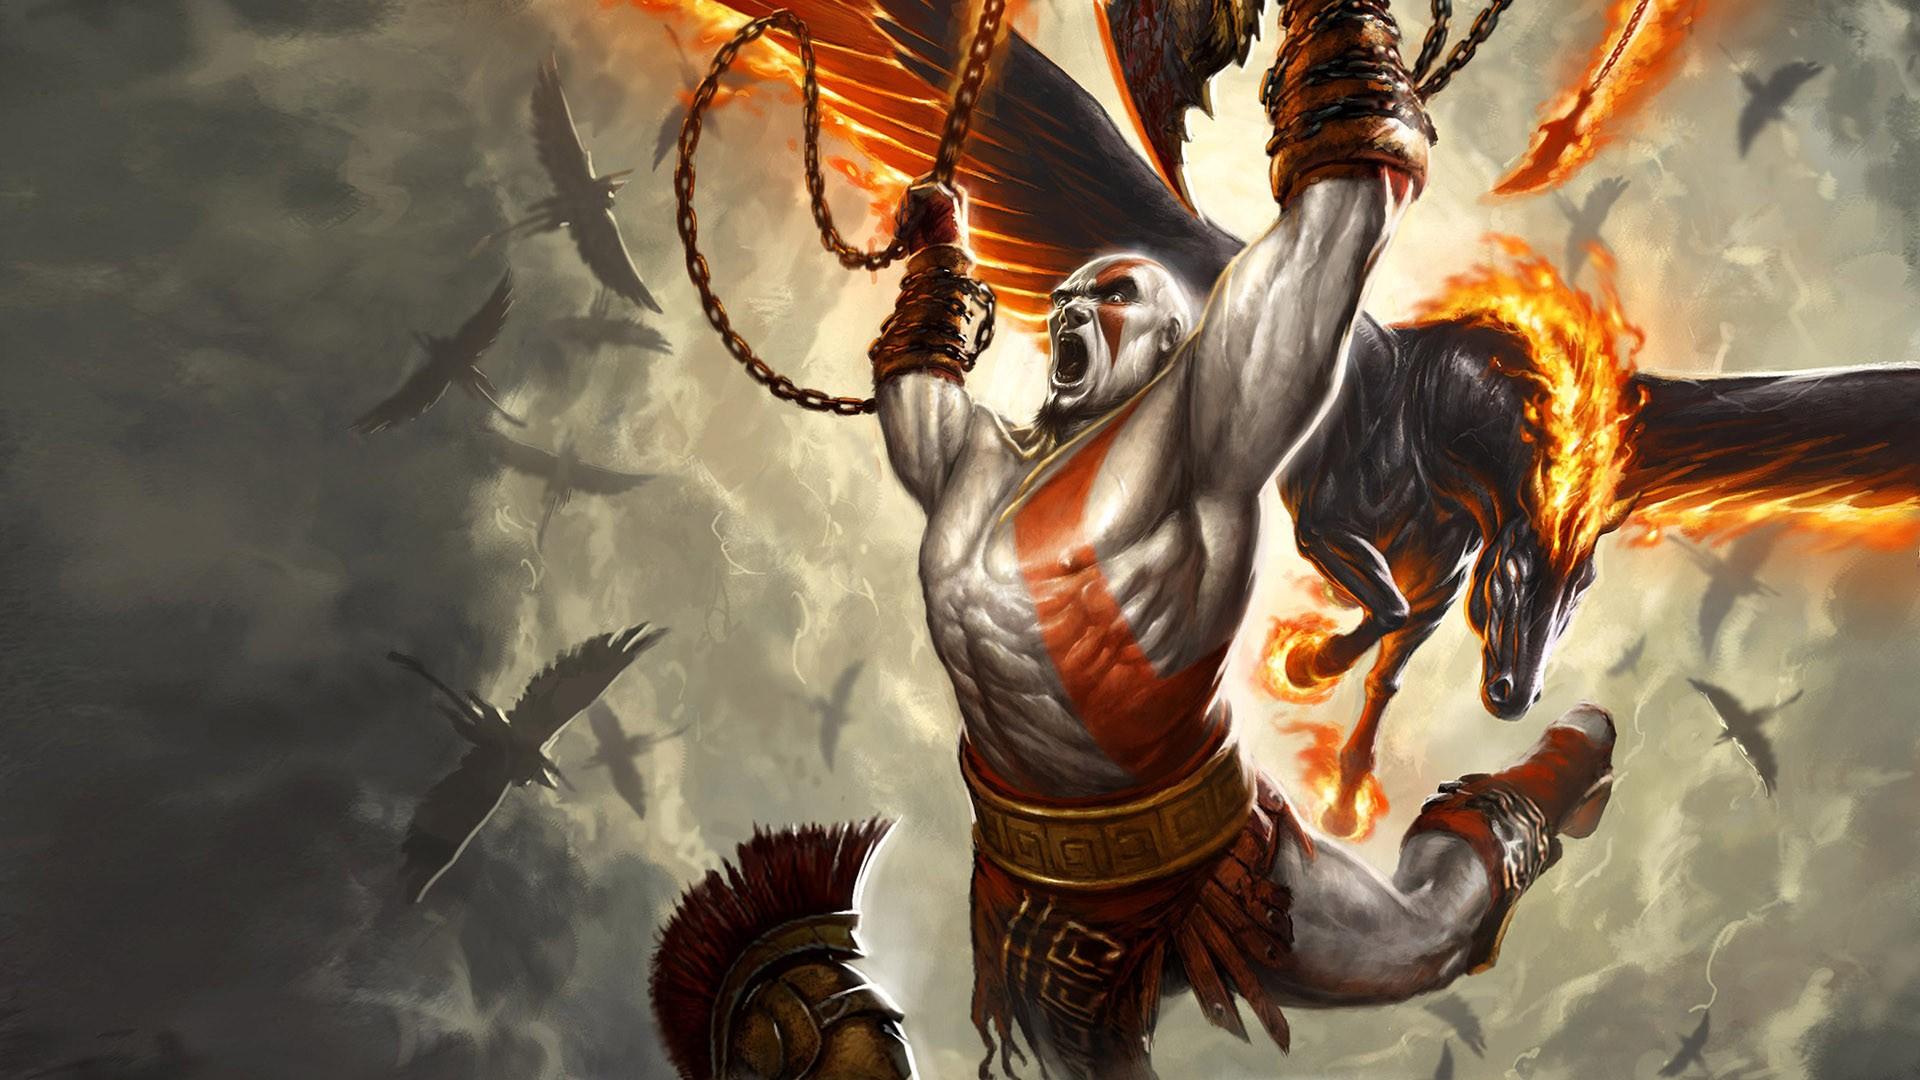 God of war iii full hd wallpaper and background image 1920x1080 video game god of war iii pegasus kratos god of war wallpaper download voltagebd Choice Image